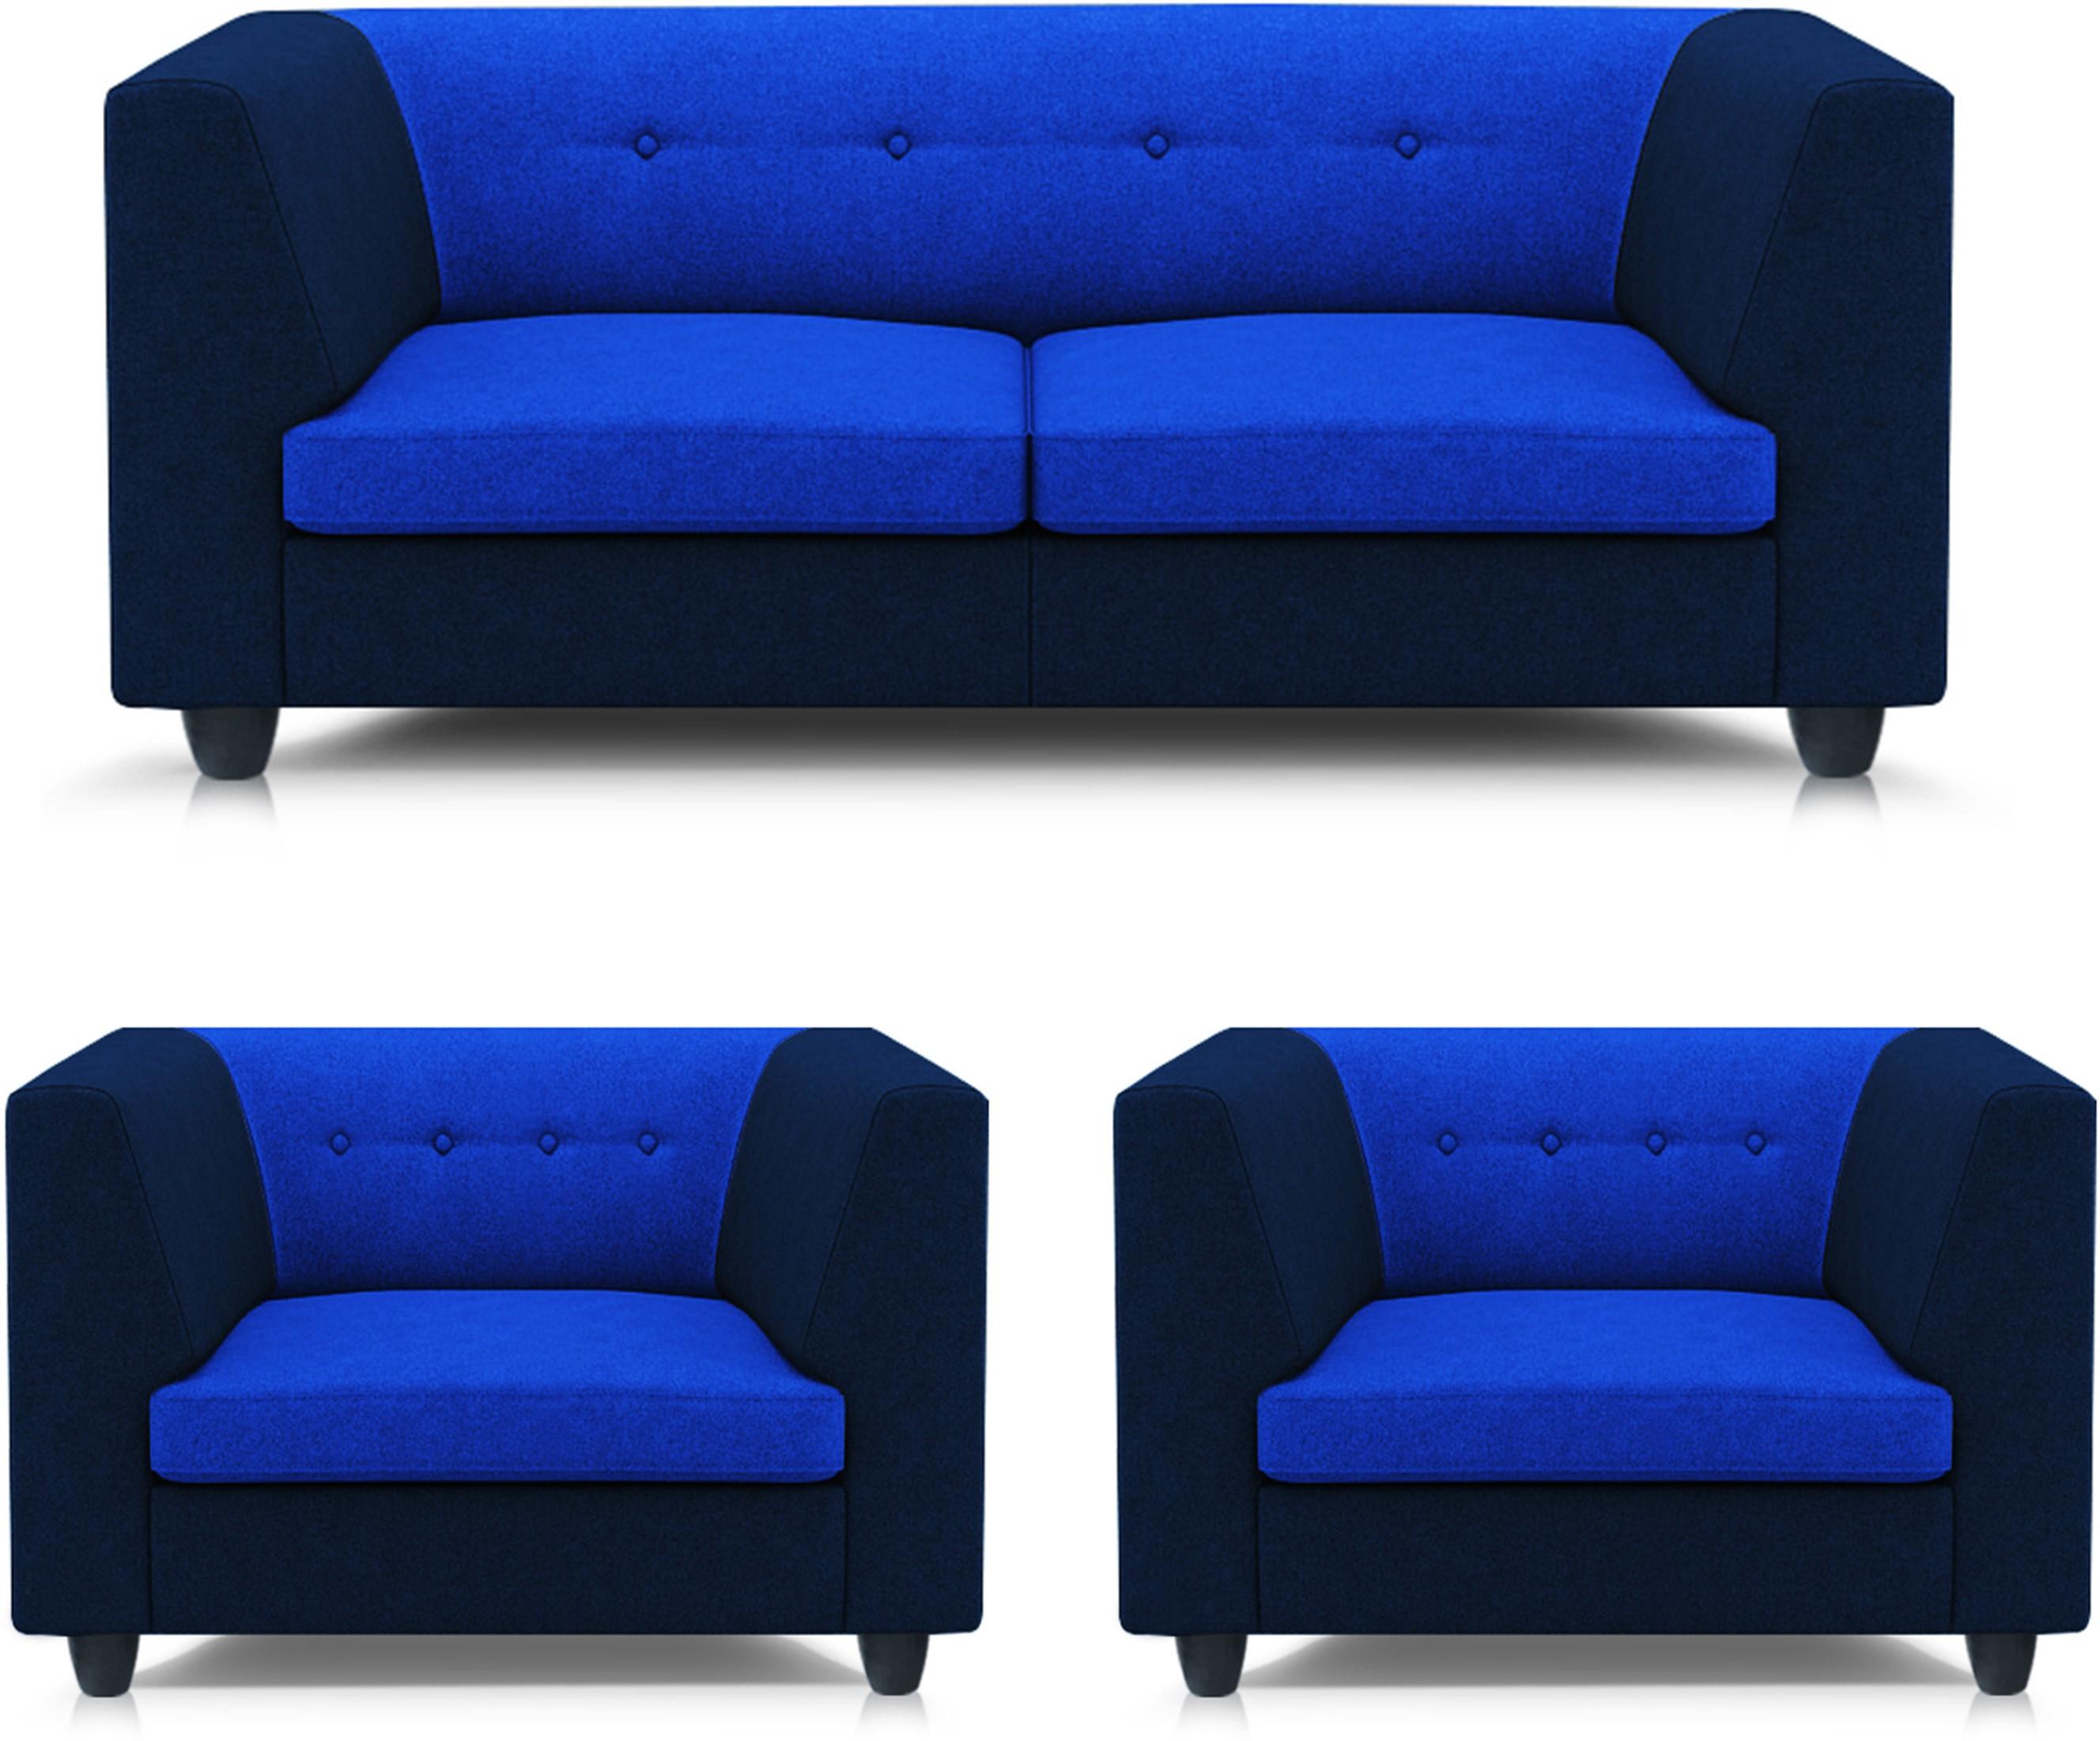 View Adorn homez Modern Solid Wood 2 + 1 + 1 Multi Sofa Set Furniture (Adorn homez)